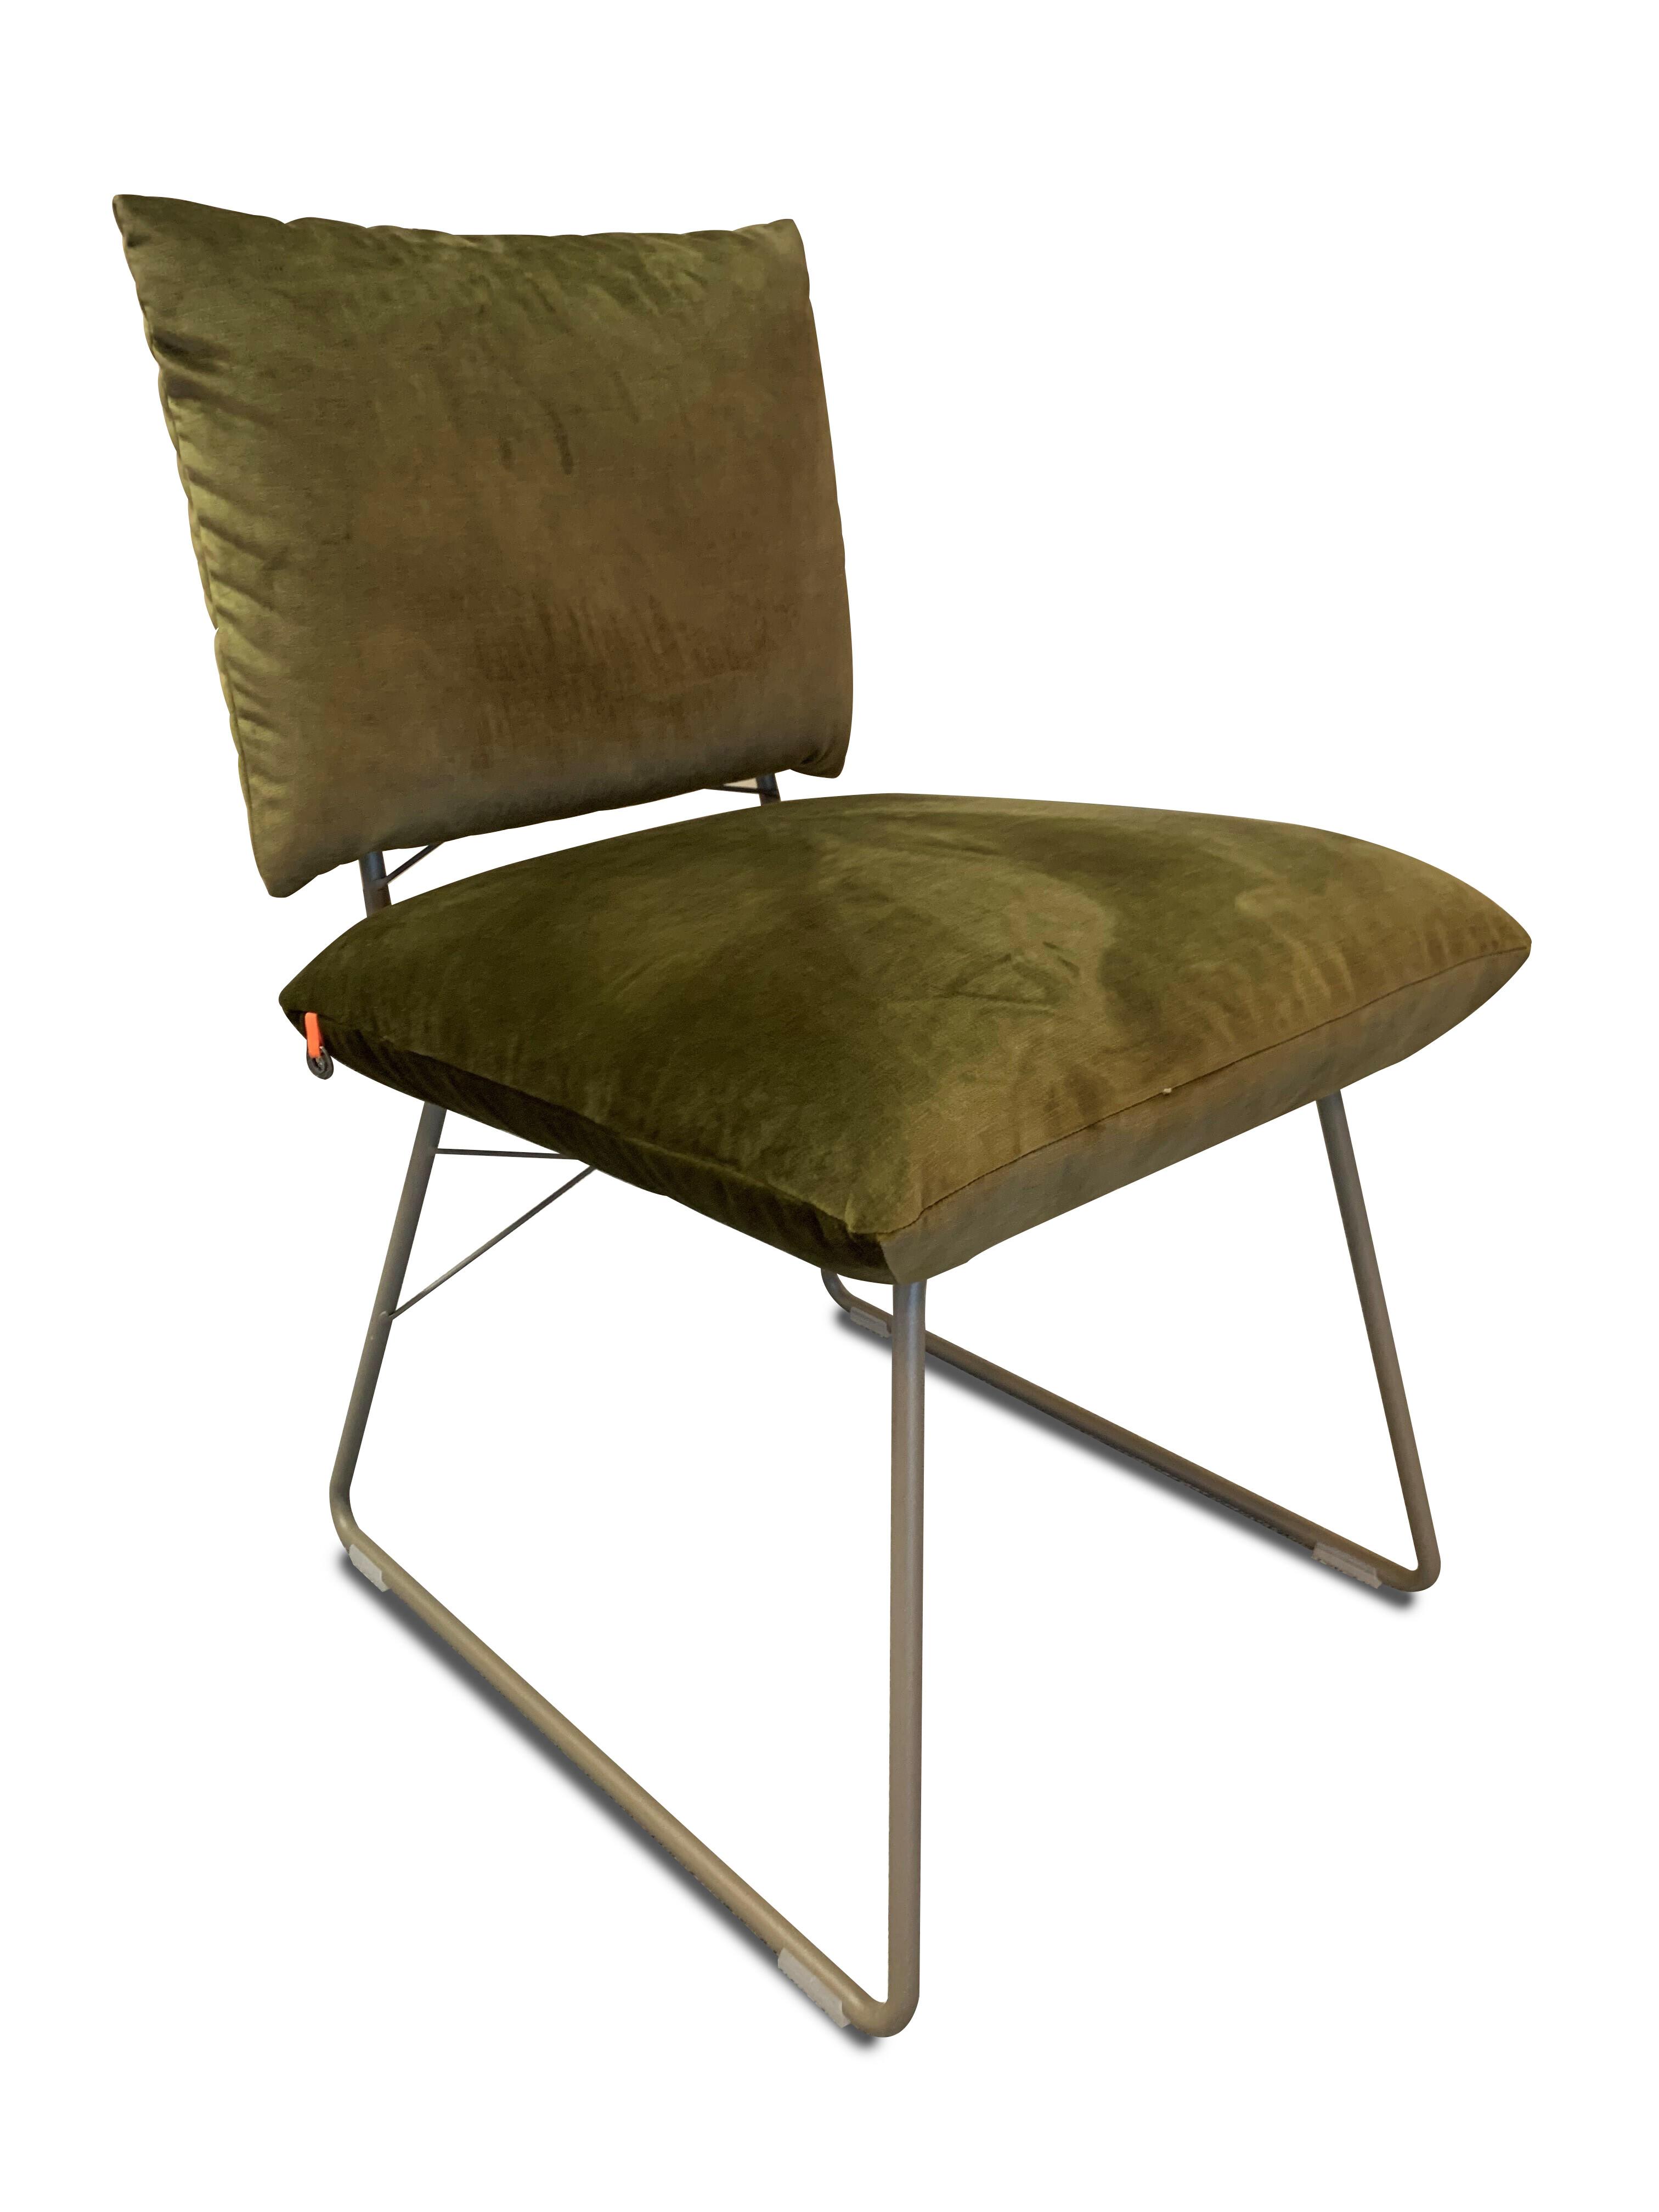 Stühle Cosy Uni von Mobitec (4 STK) 05